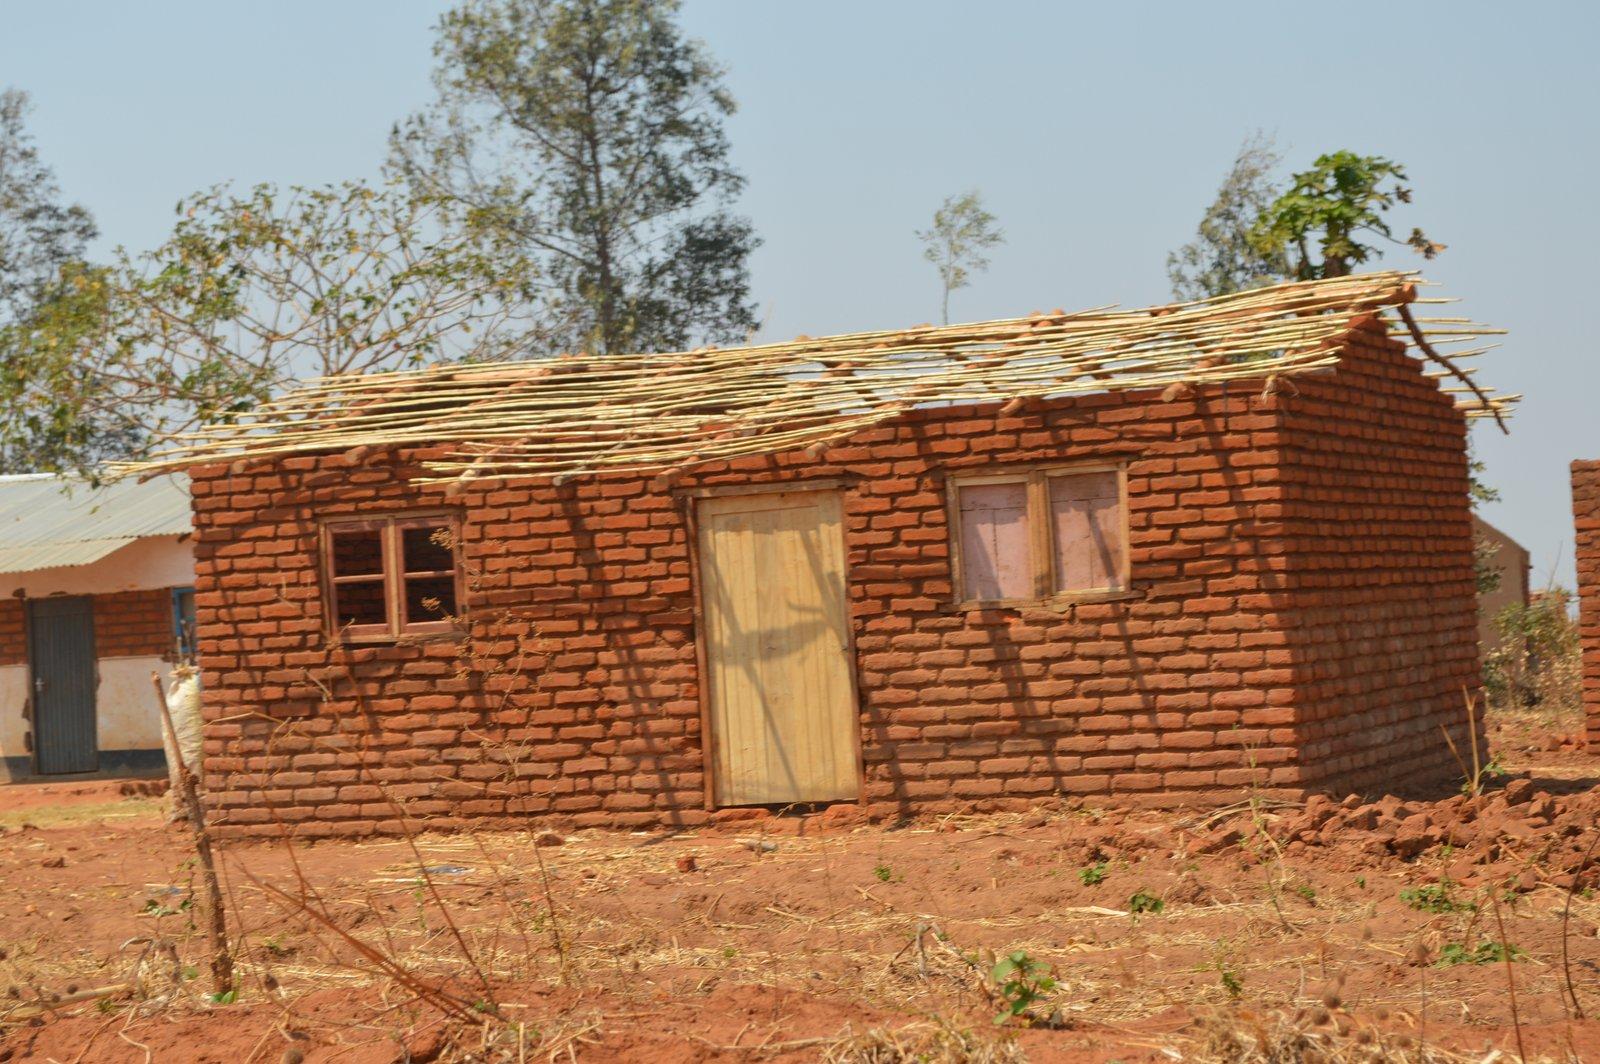 Malawi Vernacular Architecture (7)